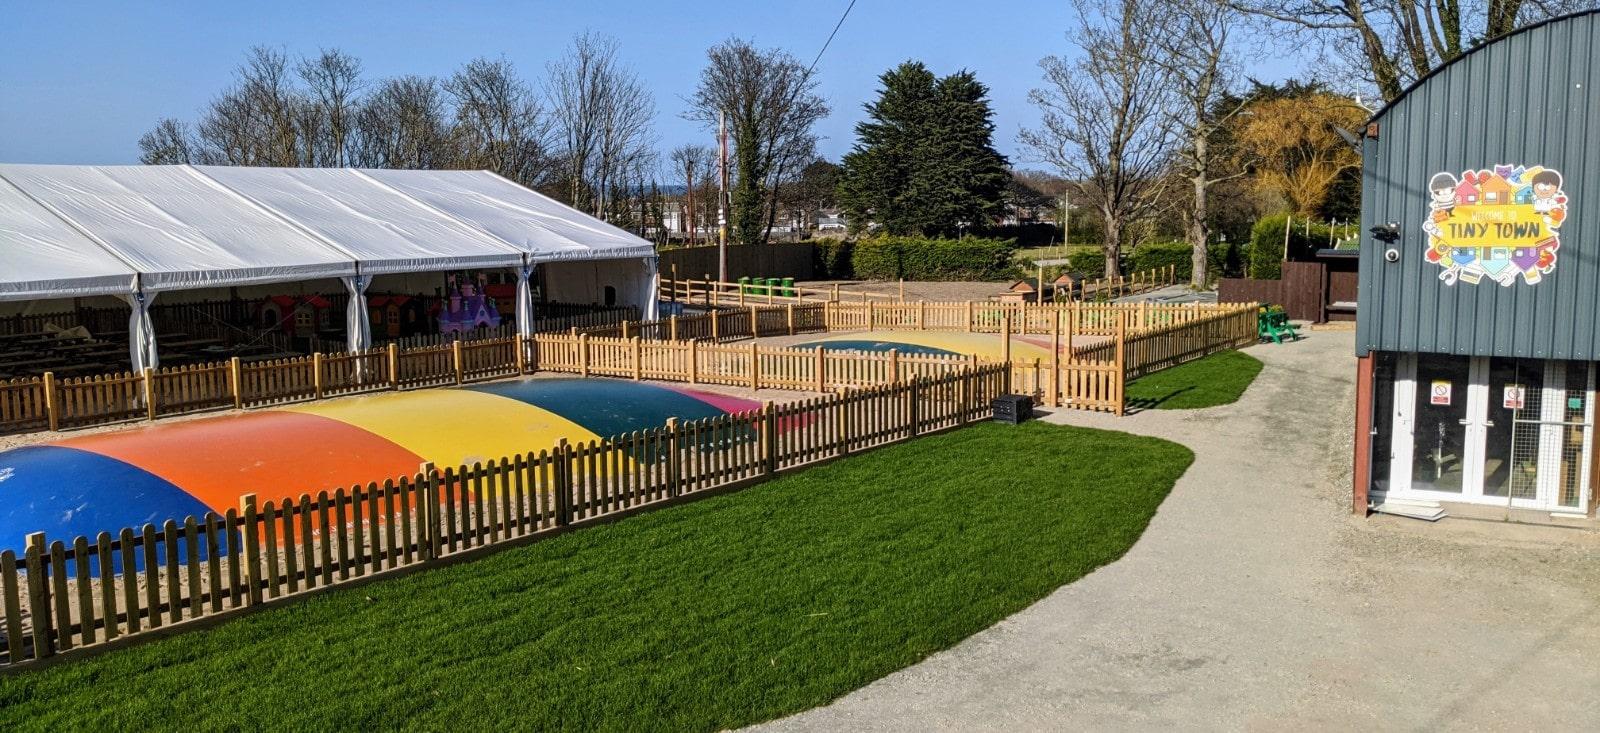 Manorafon Farm Park